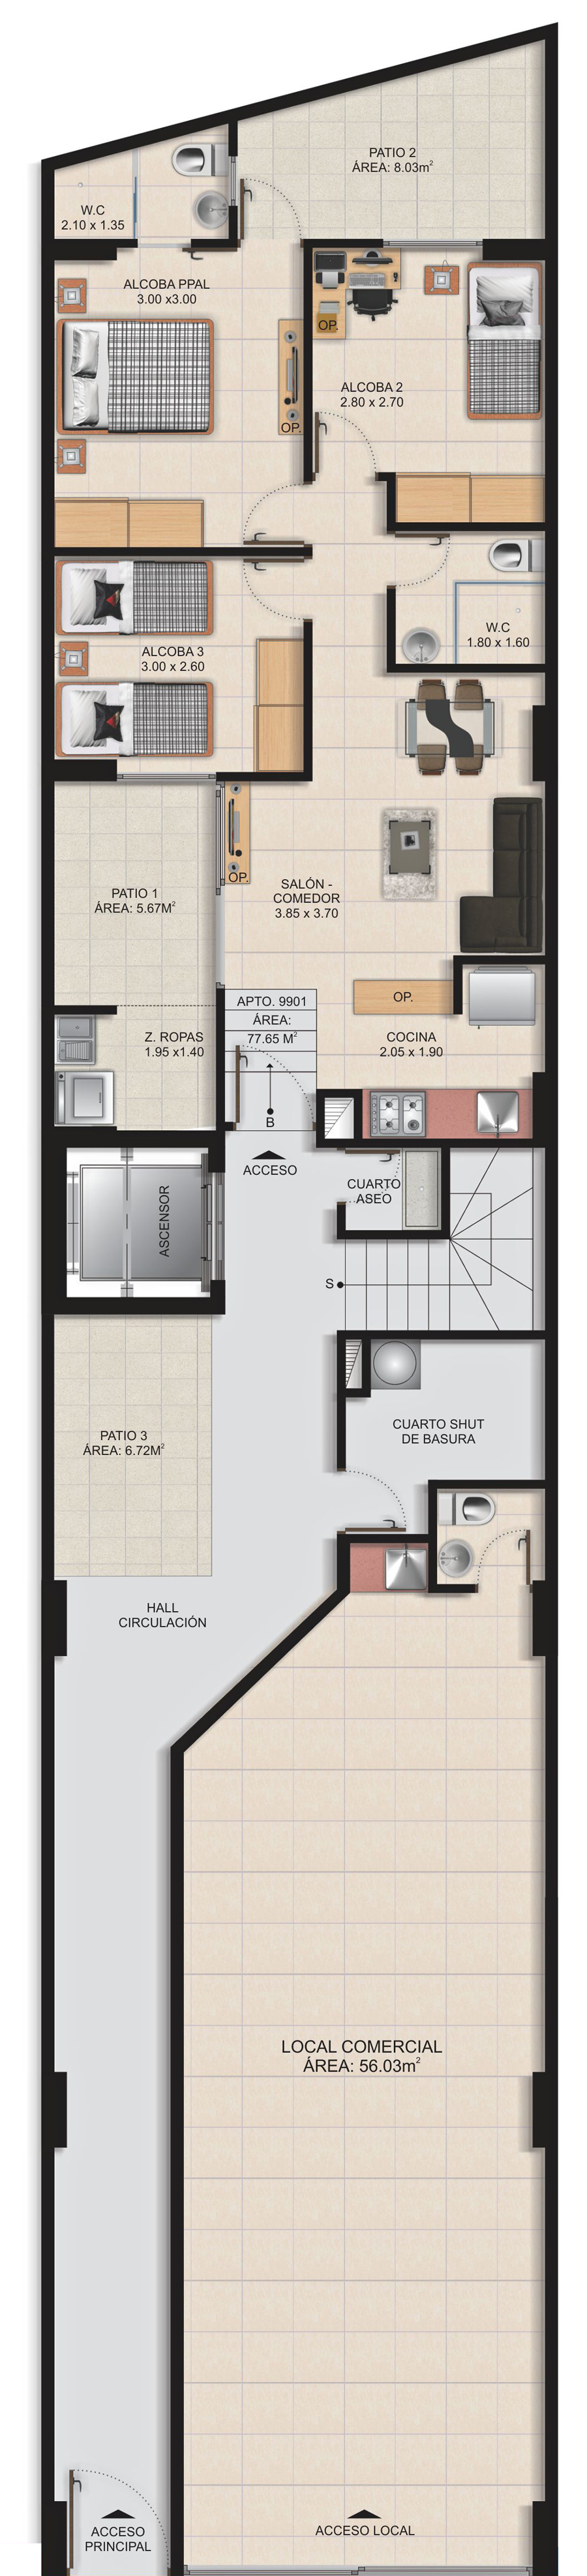 Planta Típica Áreas Comunes Apartamentos San Arcangel